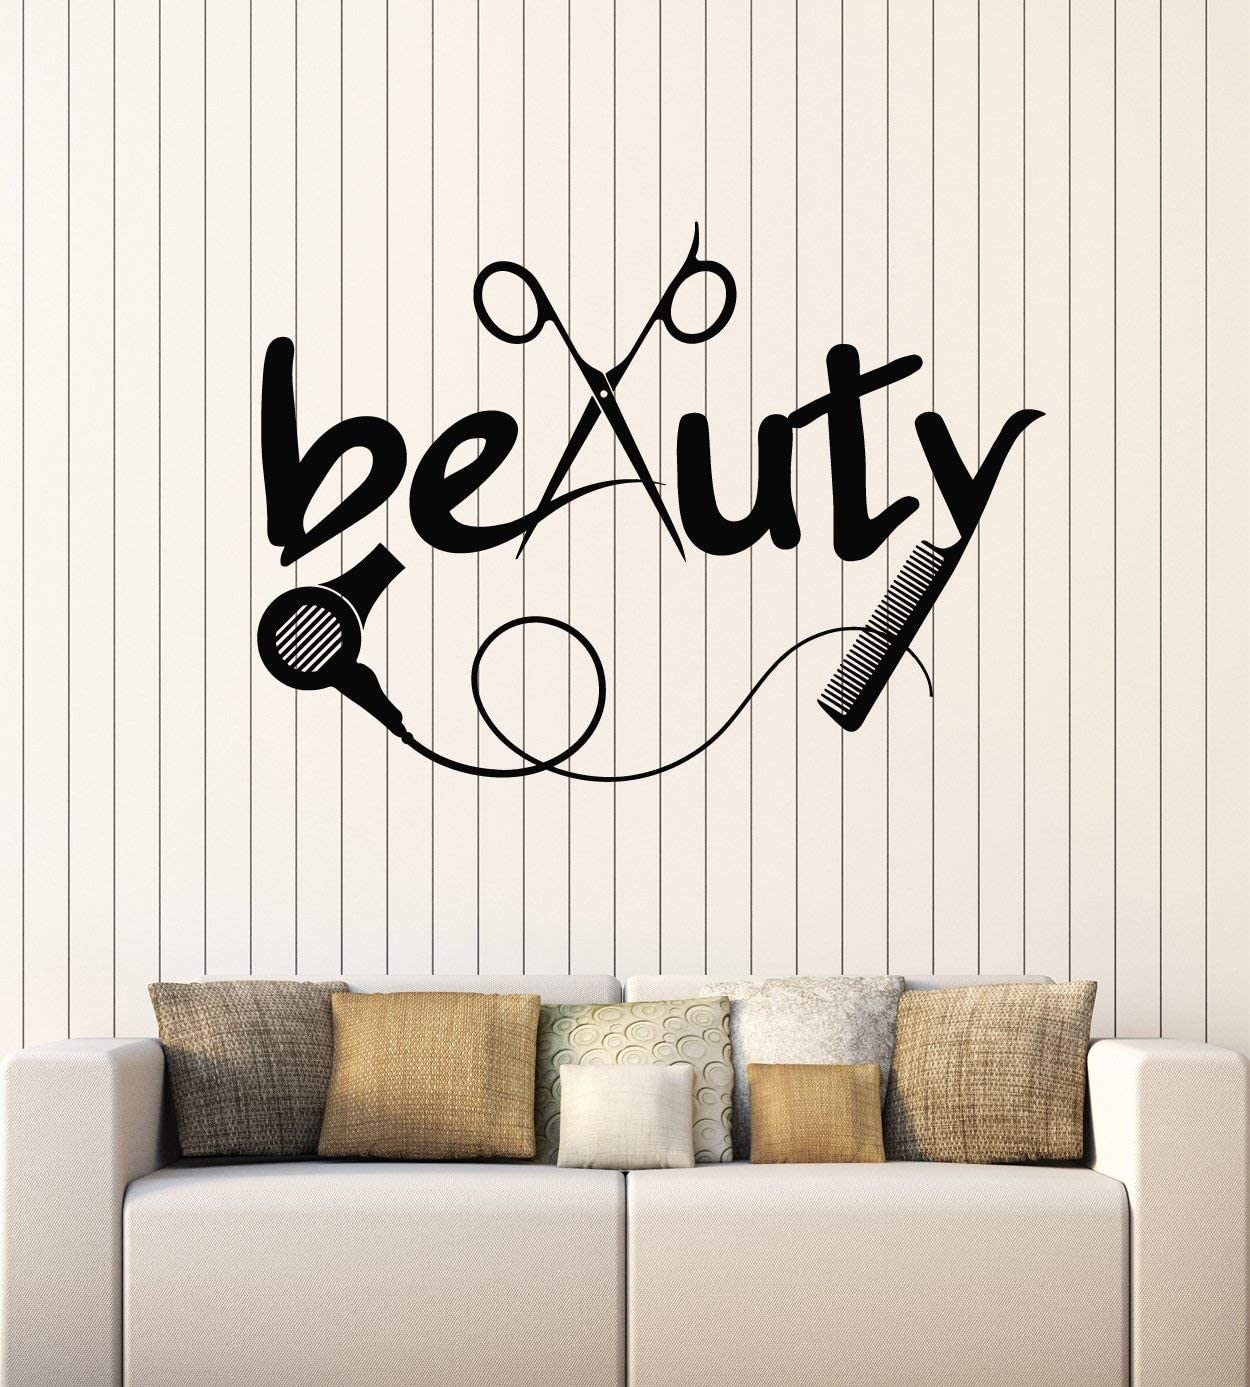 Vinyl Wall Decal Barber Tools Hair Hairdresser Beauty Salon Stickers Mural Large Decor (g2326) Black